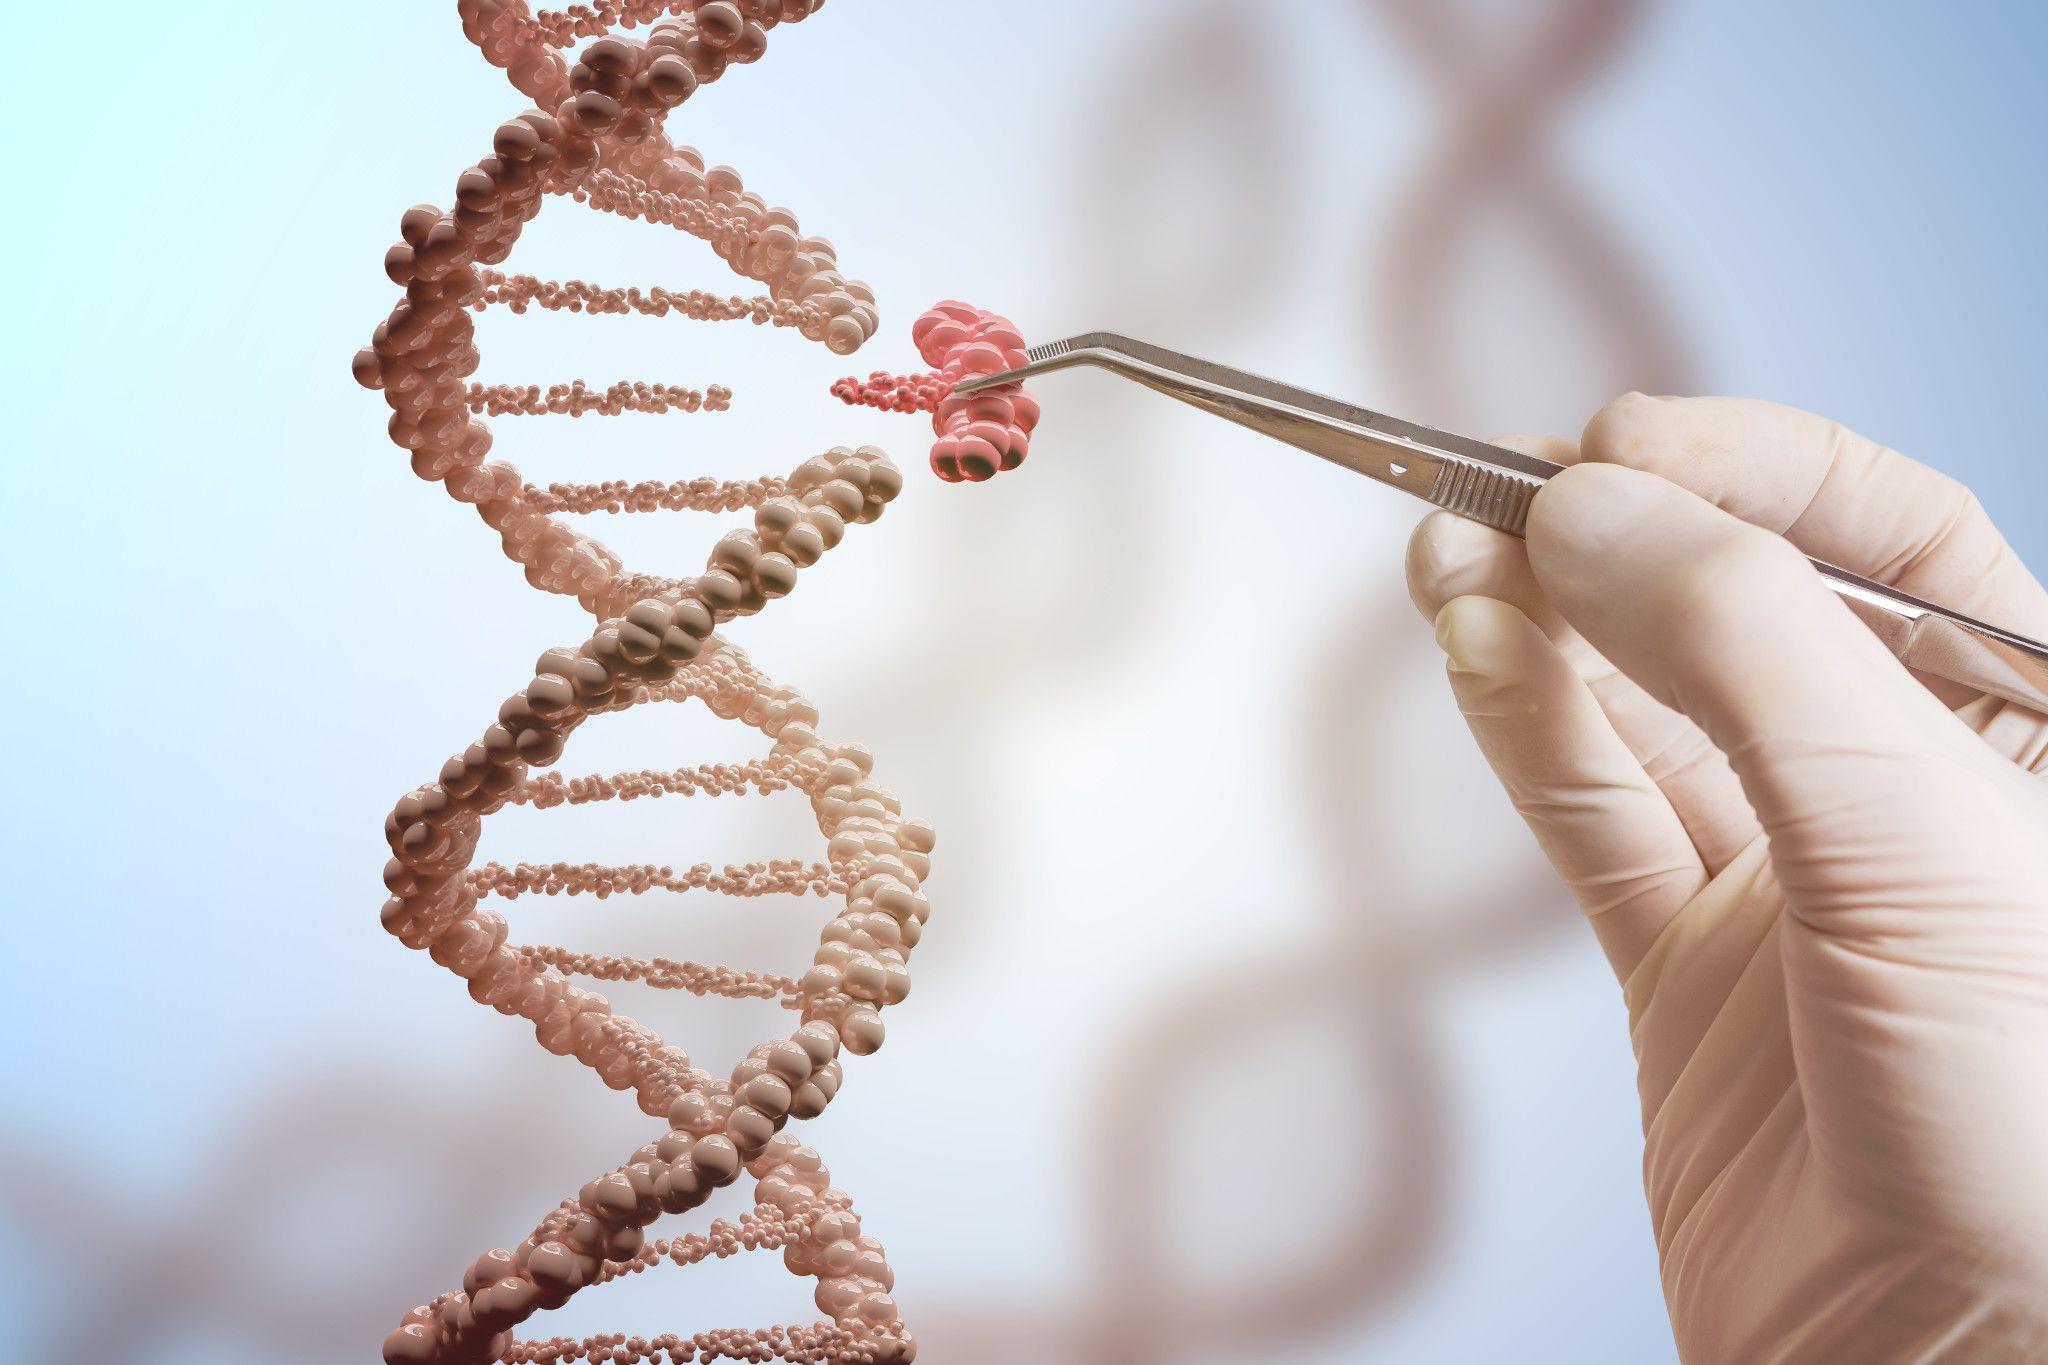 digital dna double helix genetic engineering